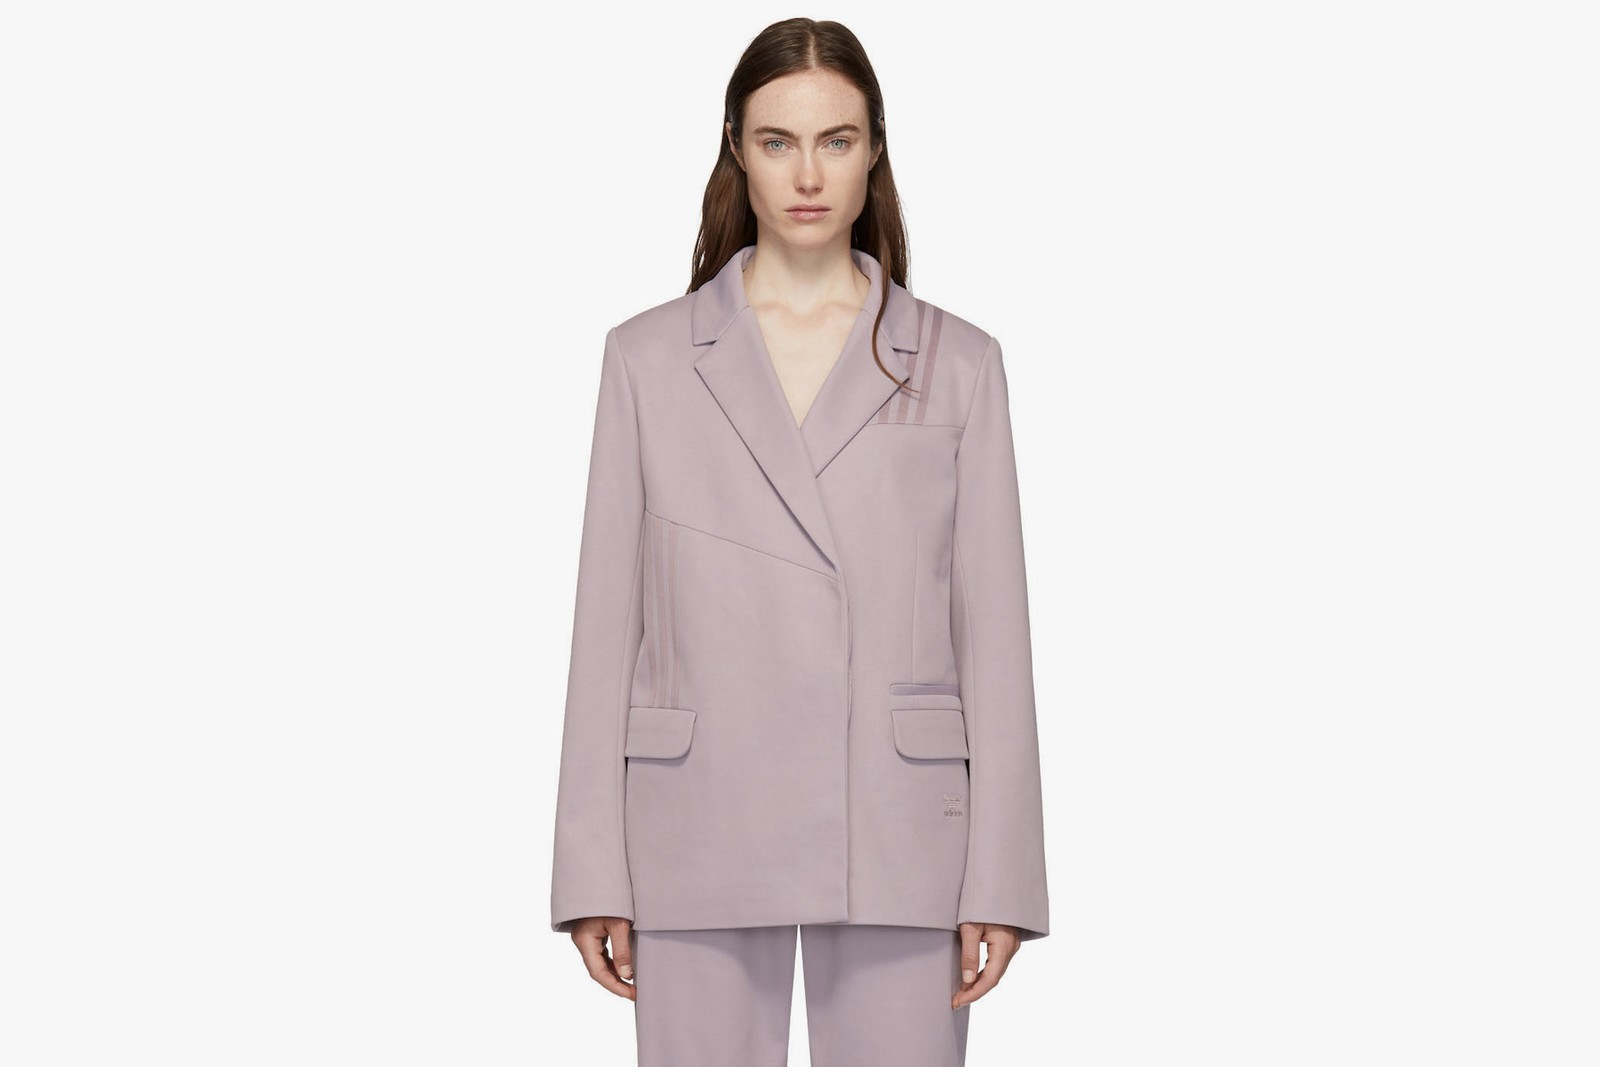 Best Fall-Ready Blazers from Gucci, Acne Studios Danielle Cathari Maison Margiela Charles Jeffrey LOVERBOY Adidas Originals Danielle Cathari